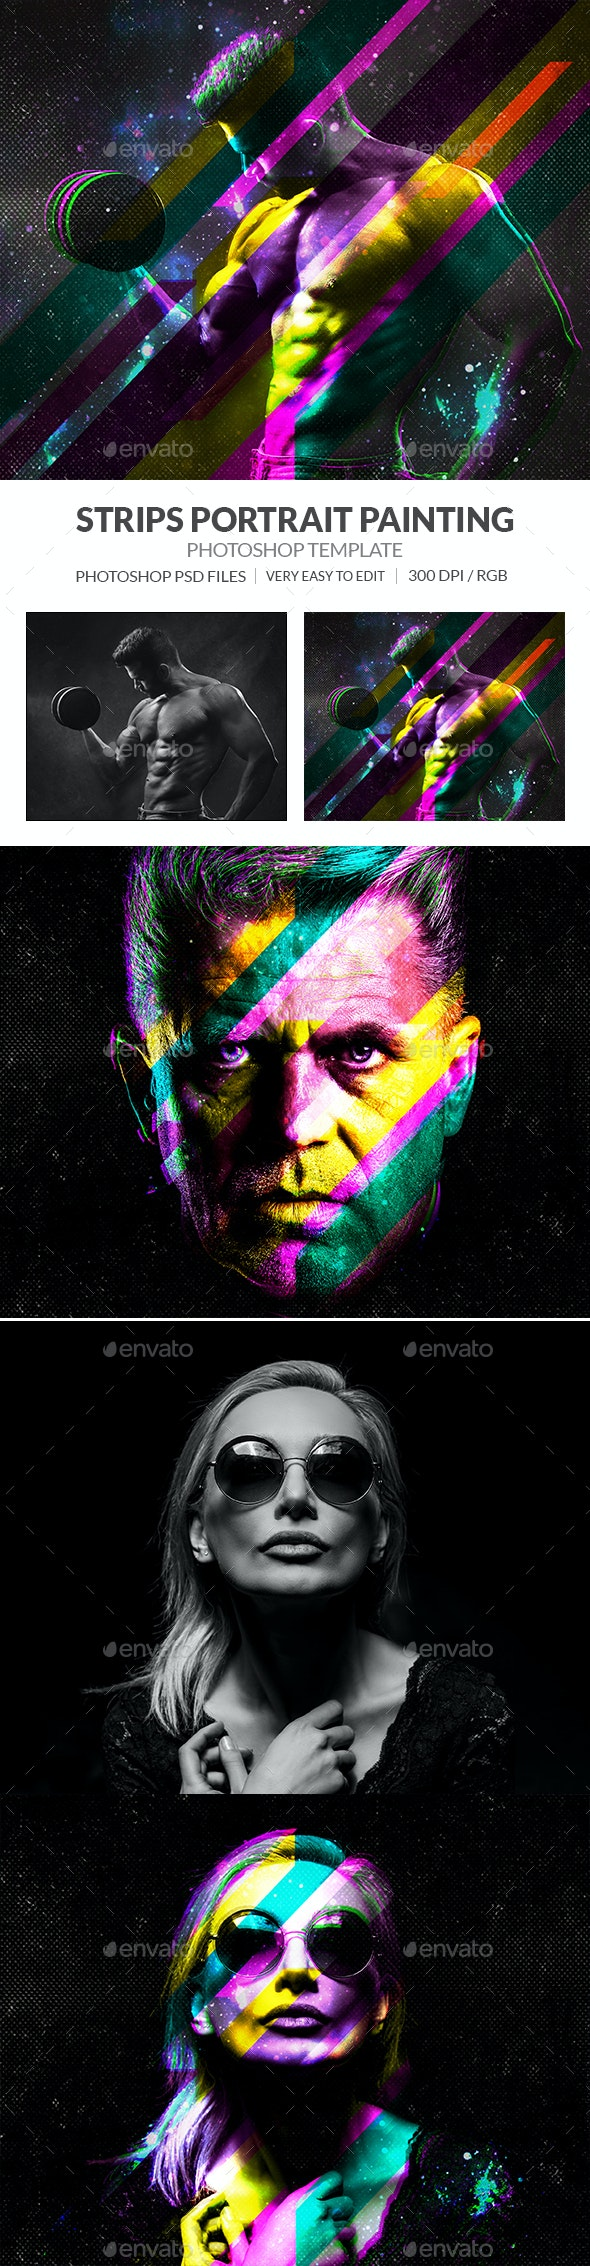 Strips Portrait Painting Effect - Photo Templates Graphics